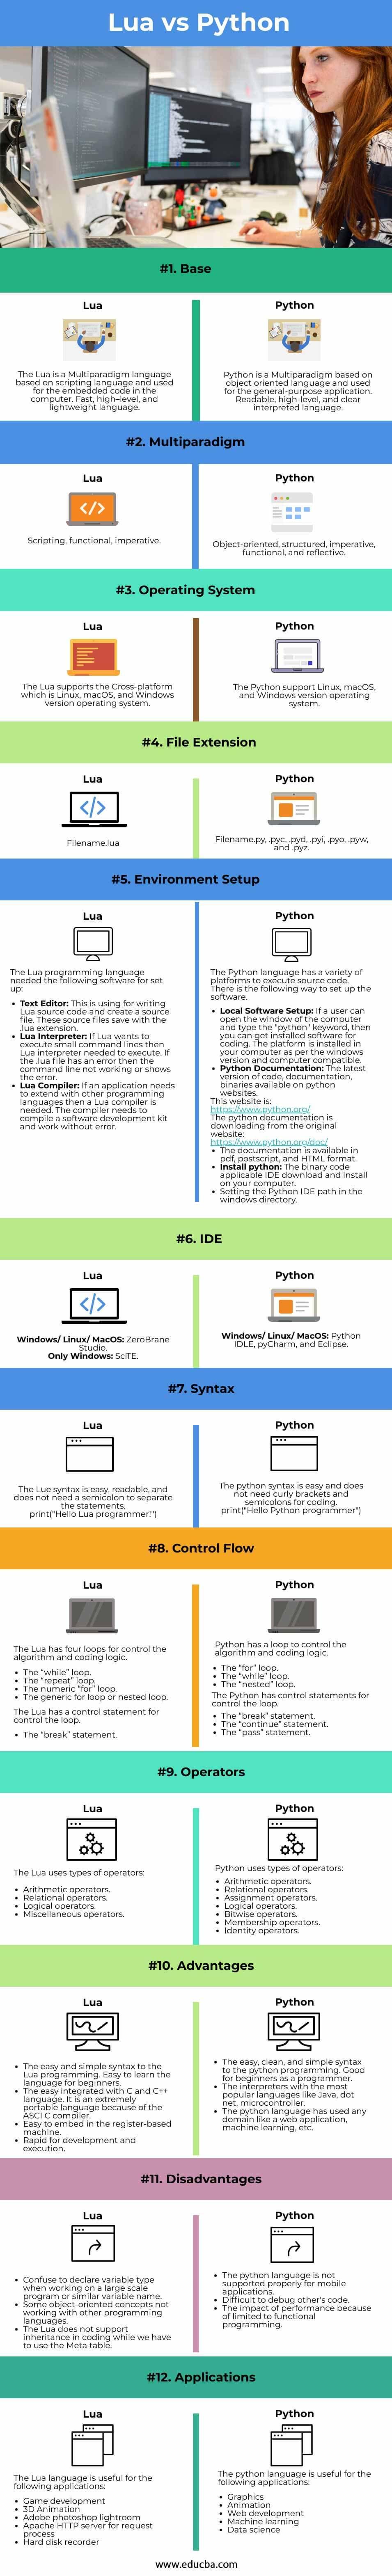 Lua-vs-Python-info